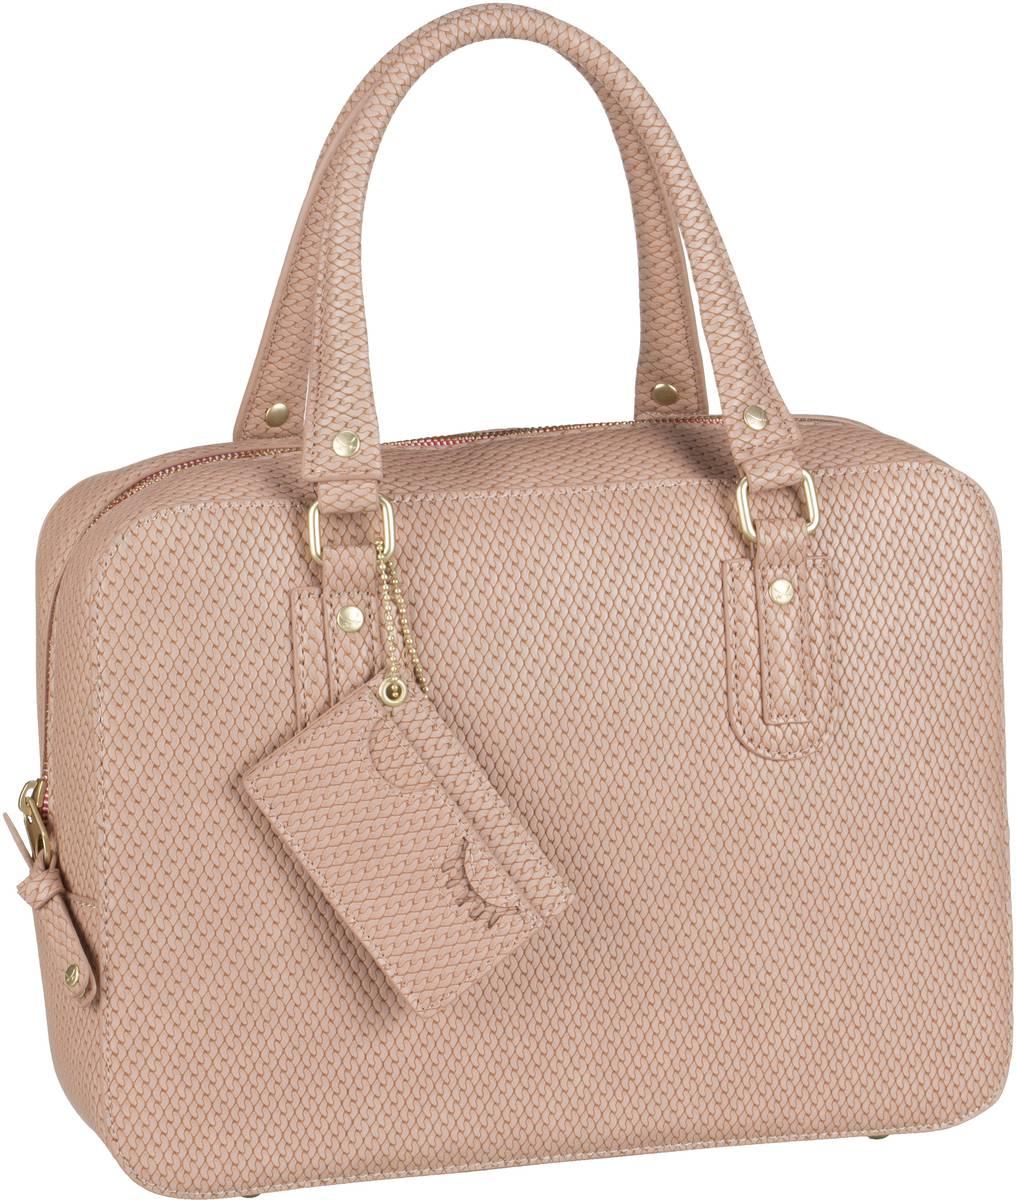 Handtasche Bowling Bag 1258 Rose